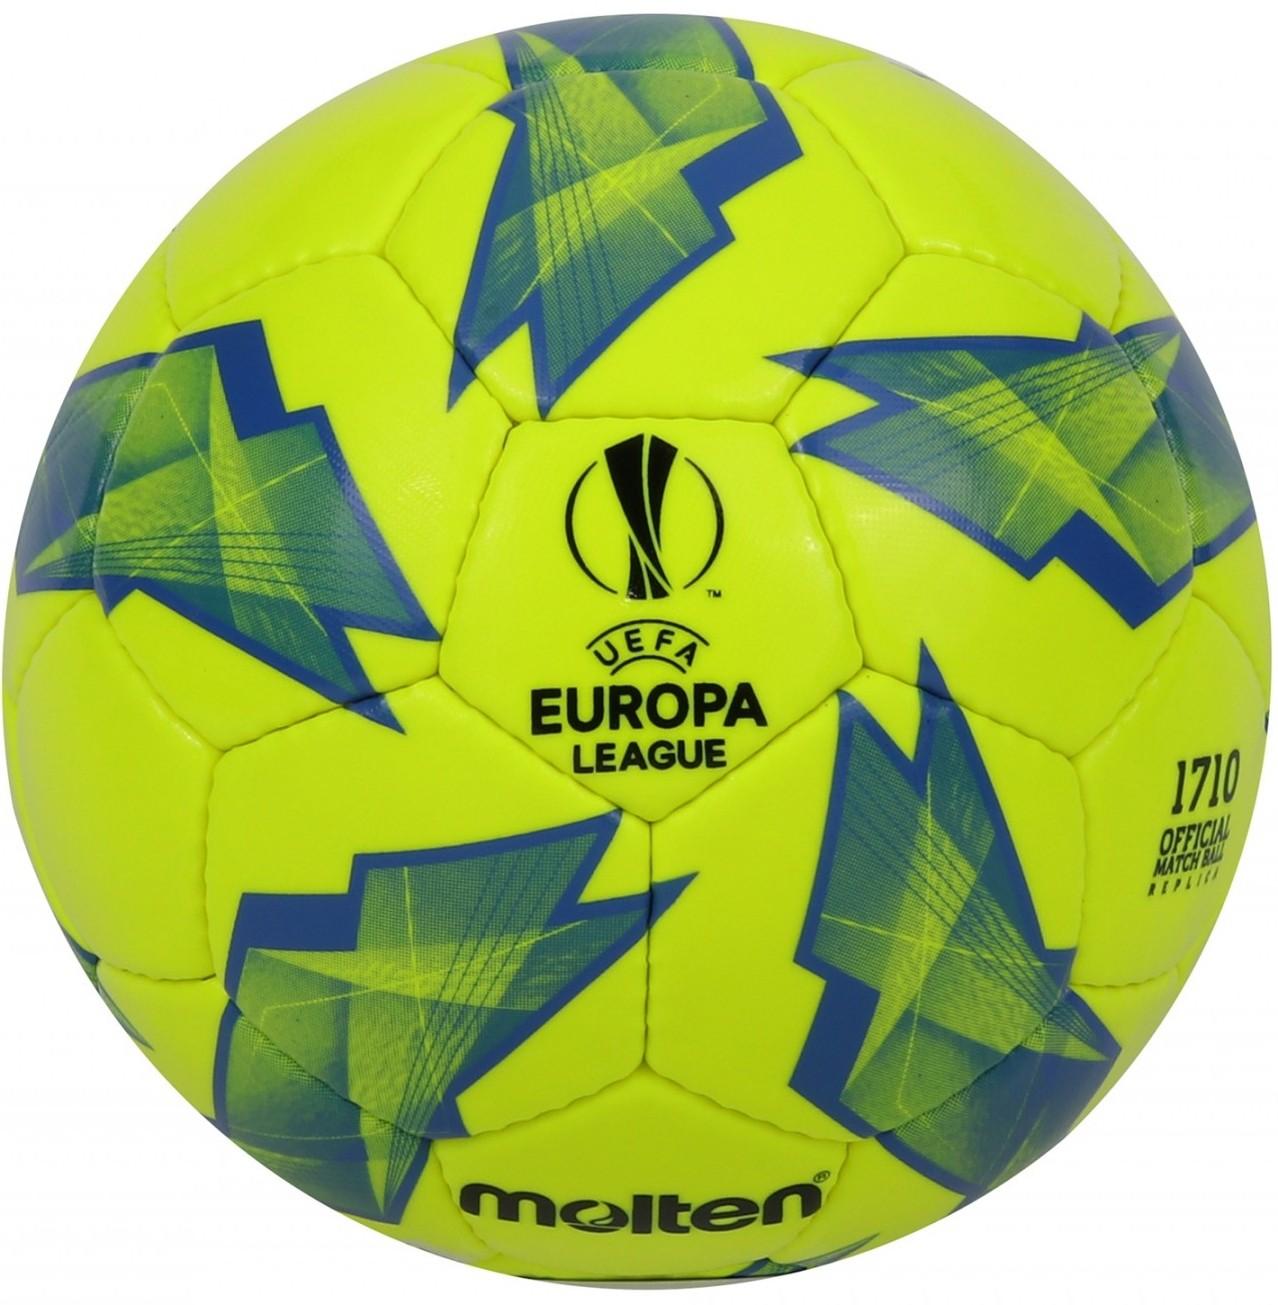 Official Match ball Replica of the UEFA Europa League – 1710 Model Yellow/Blue